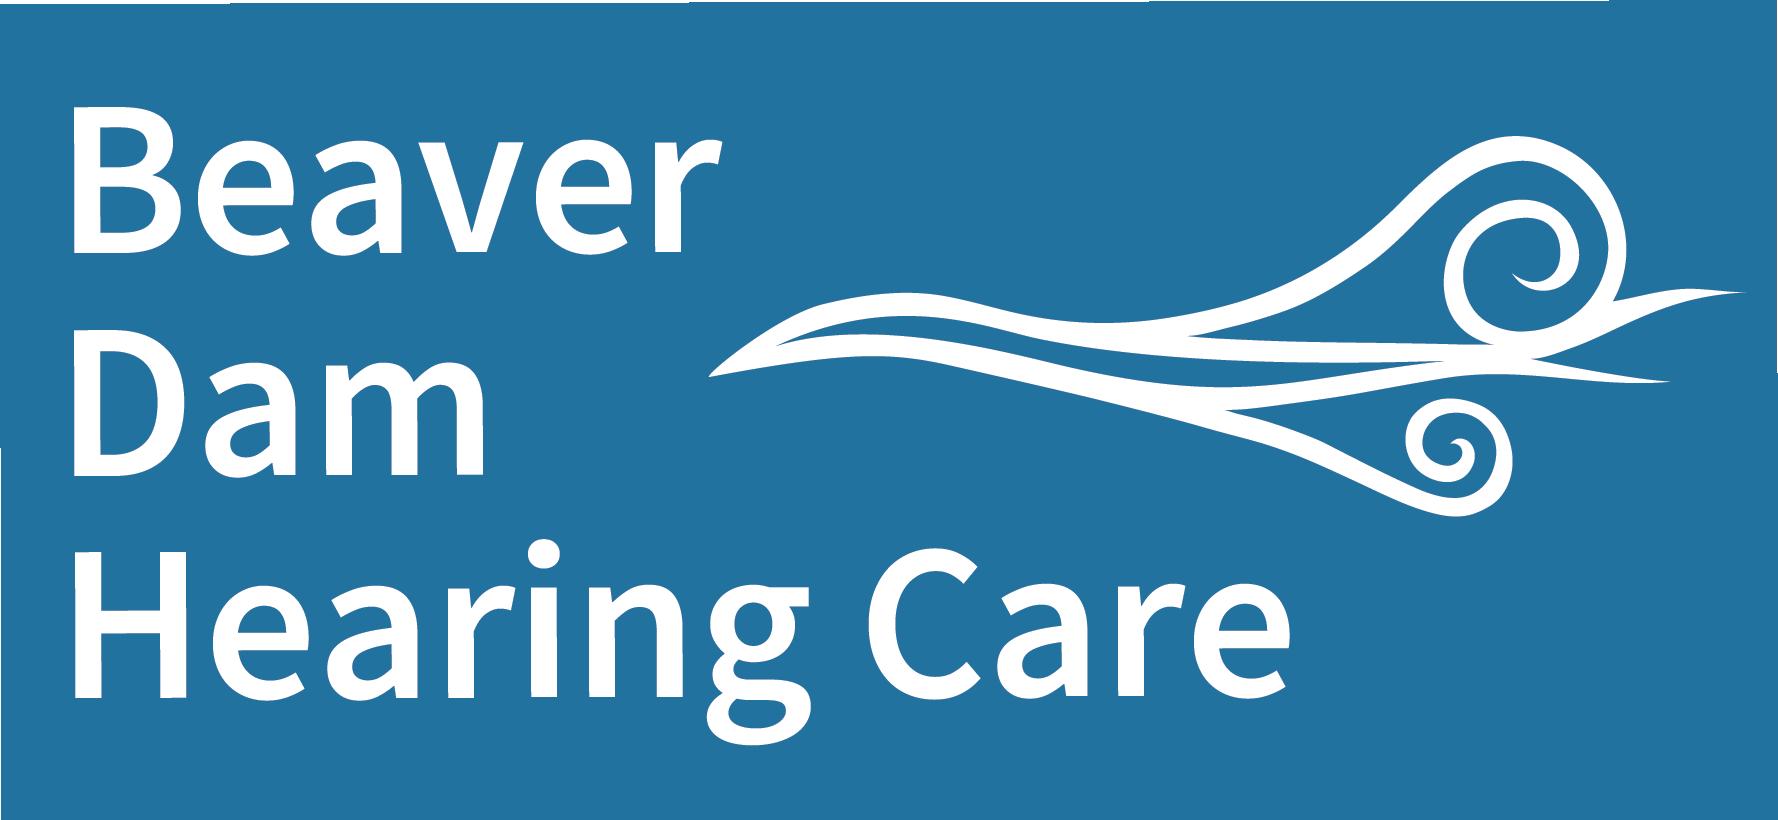 Beaver Dam Hearing Care logo